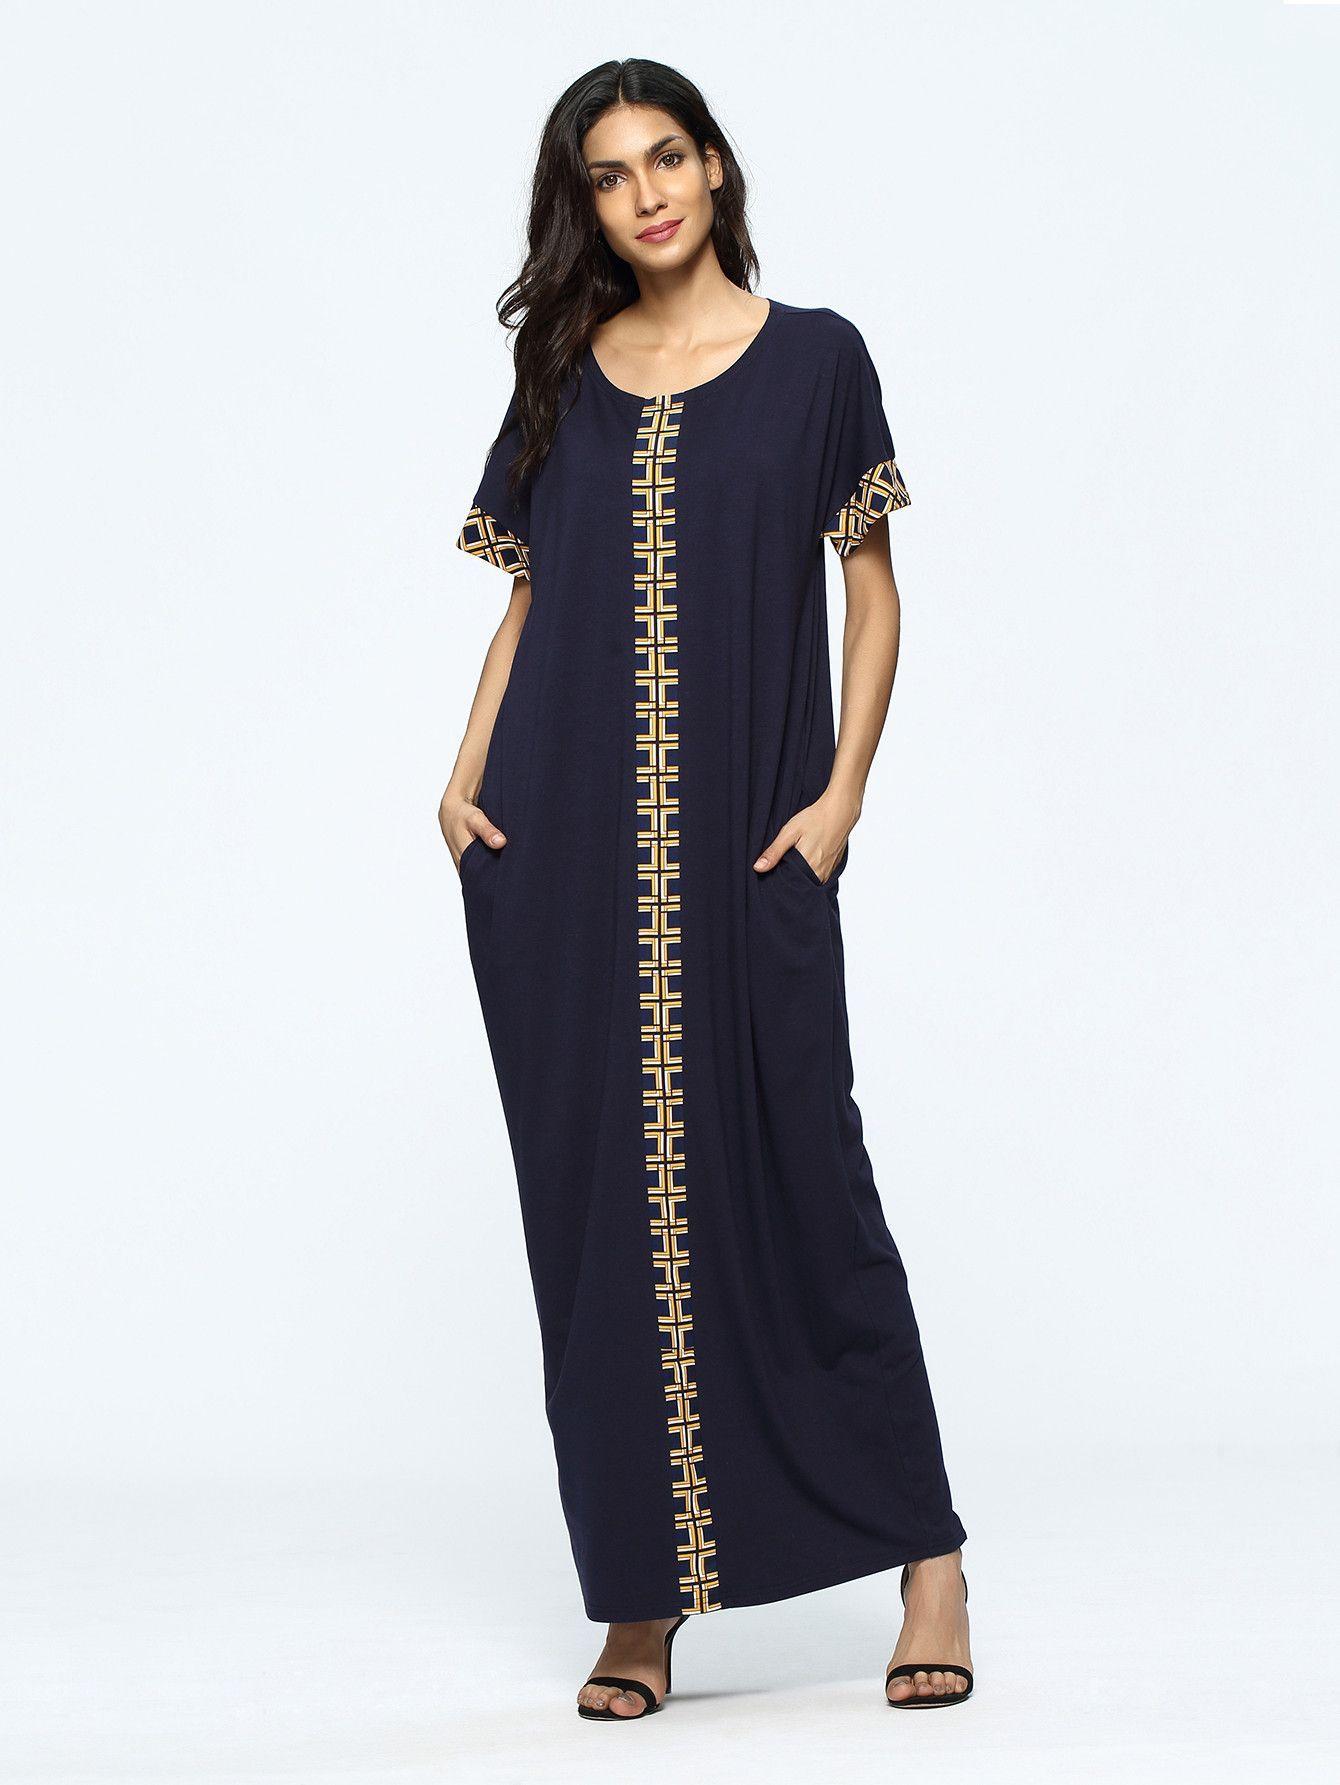 137155b754078c Fabric  Fabric has some stretch Season  Summer Type  Tshirt Pattern Type  Geometric  Sleeve Length  Short Sleeve Color  Navy Dresses Length  Maxi Style  ...